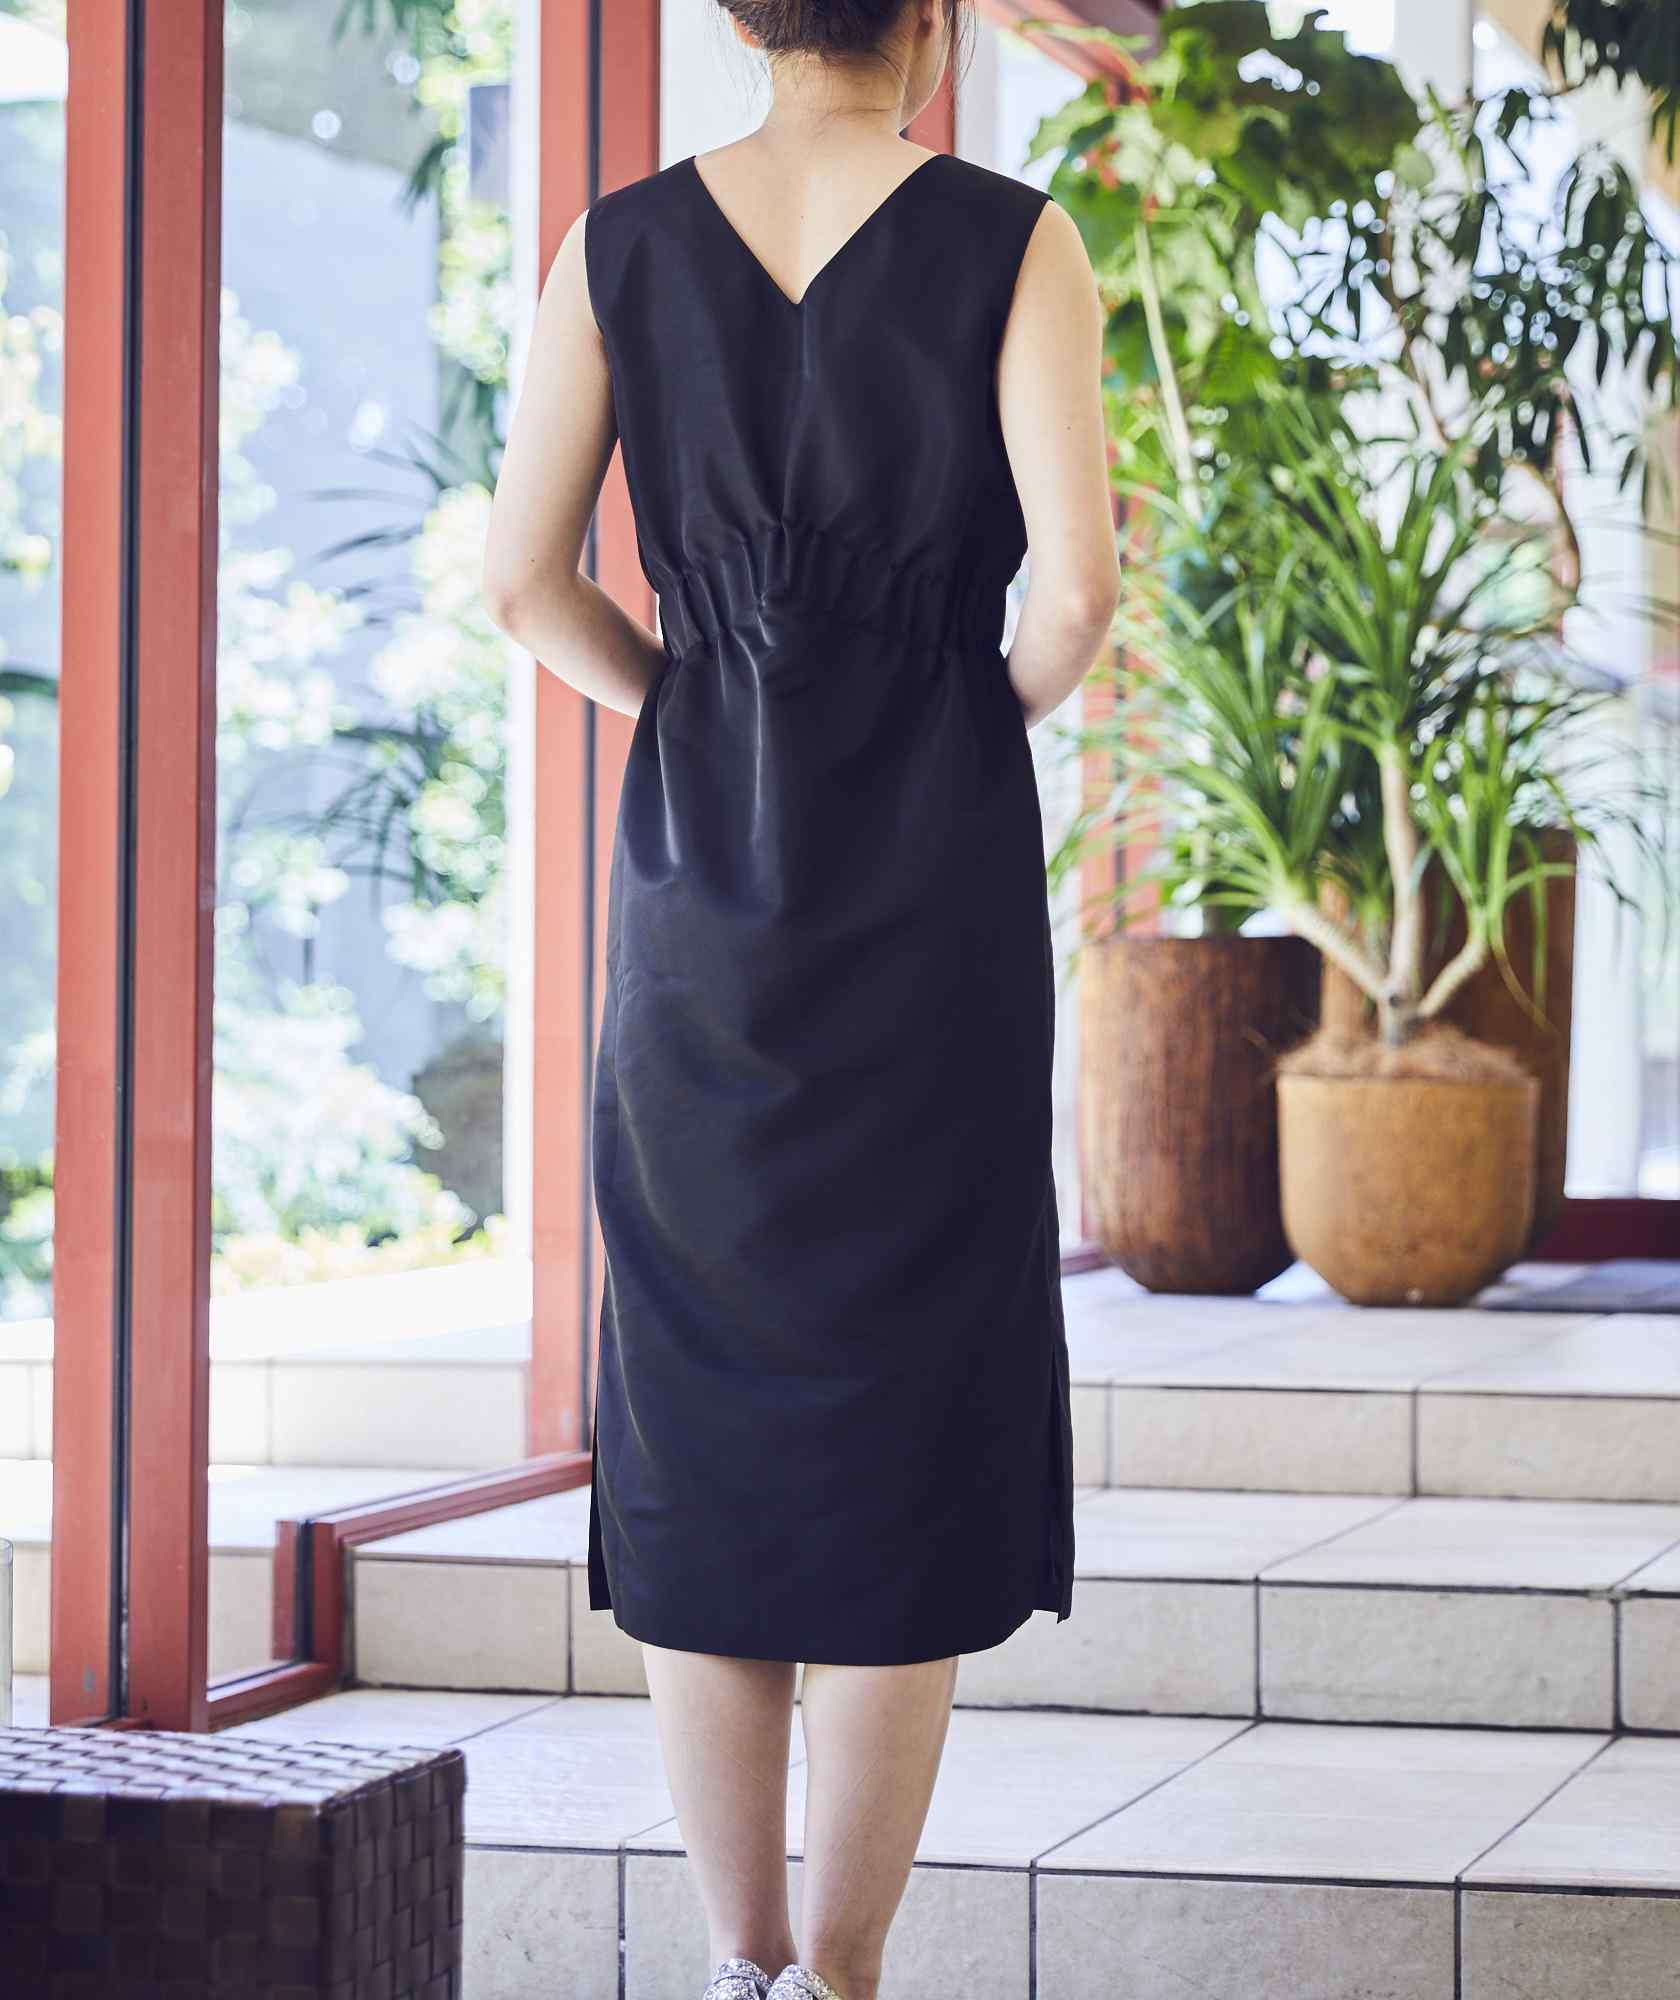 VネックシャーリングOGタイトミディアムドレス-ブラック-M